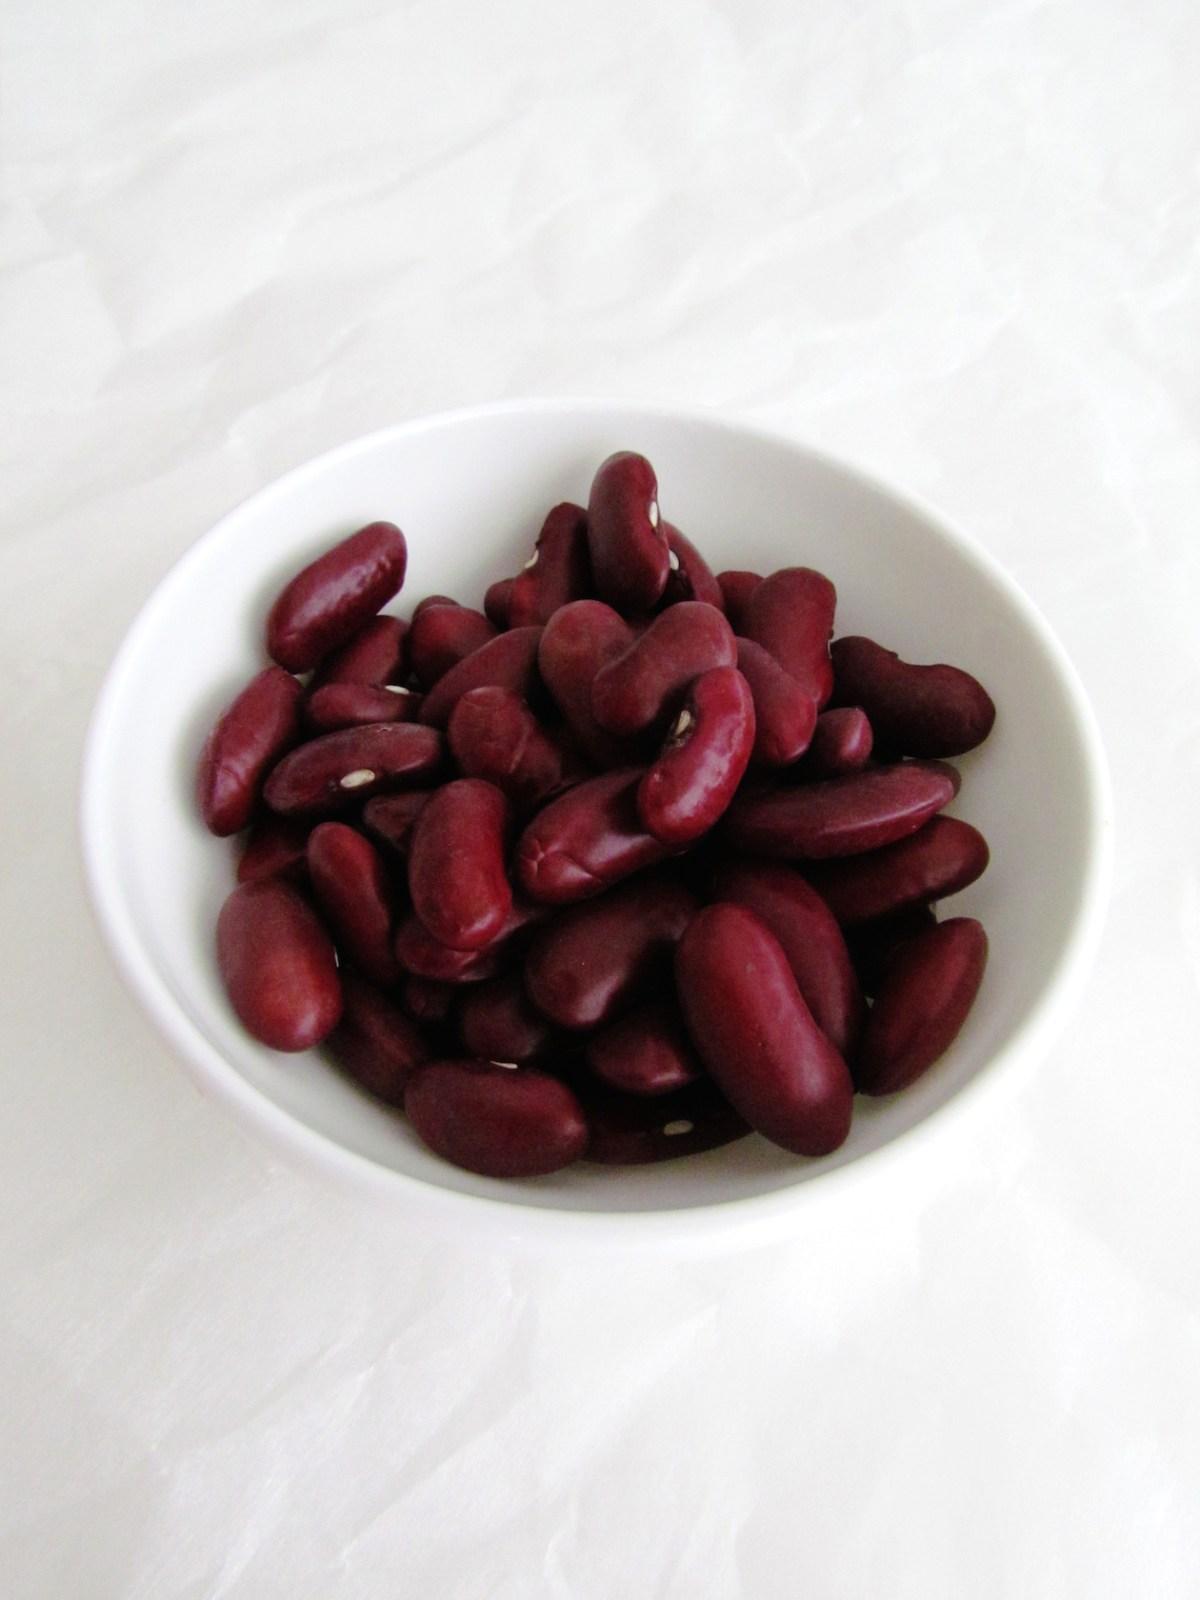 haricots rouges | www.savormania.com